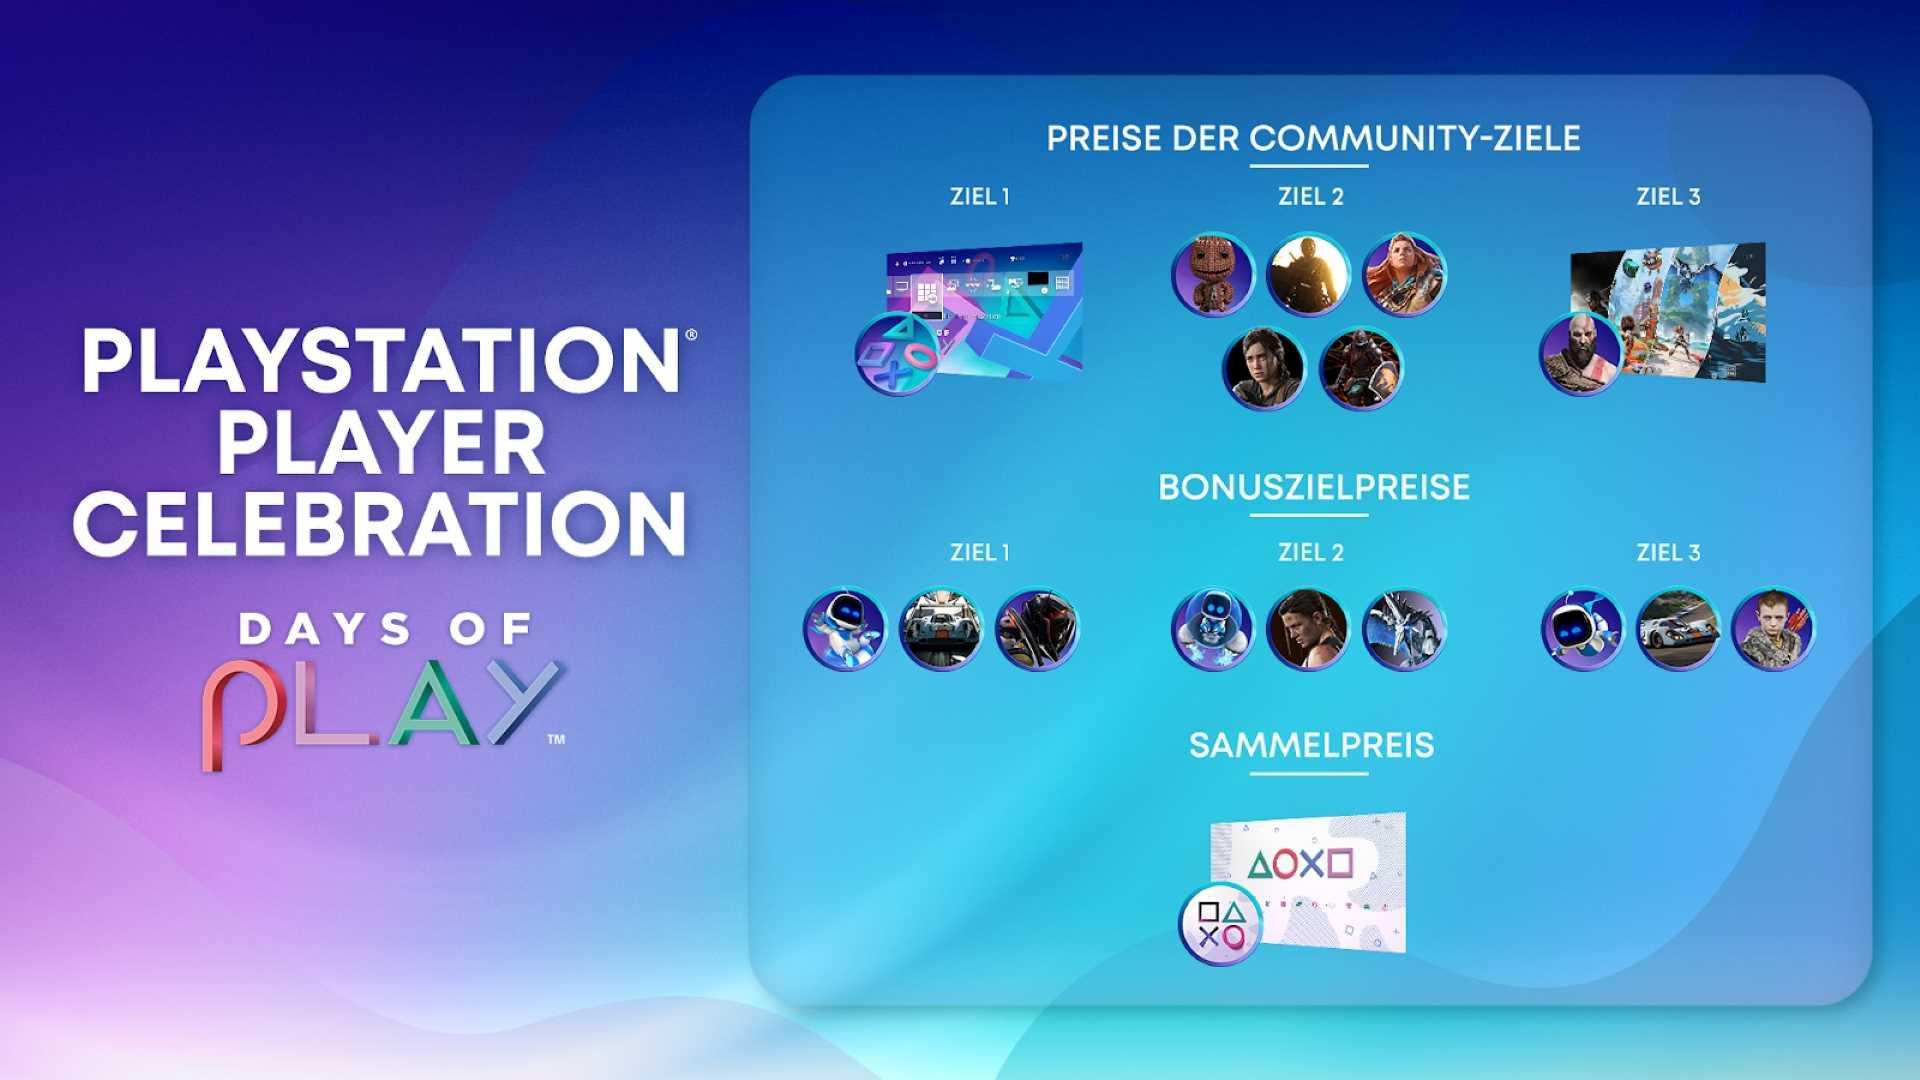 Days of Play PlayStation - Preise und Phasen